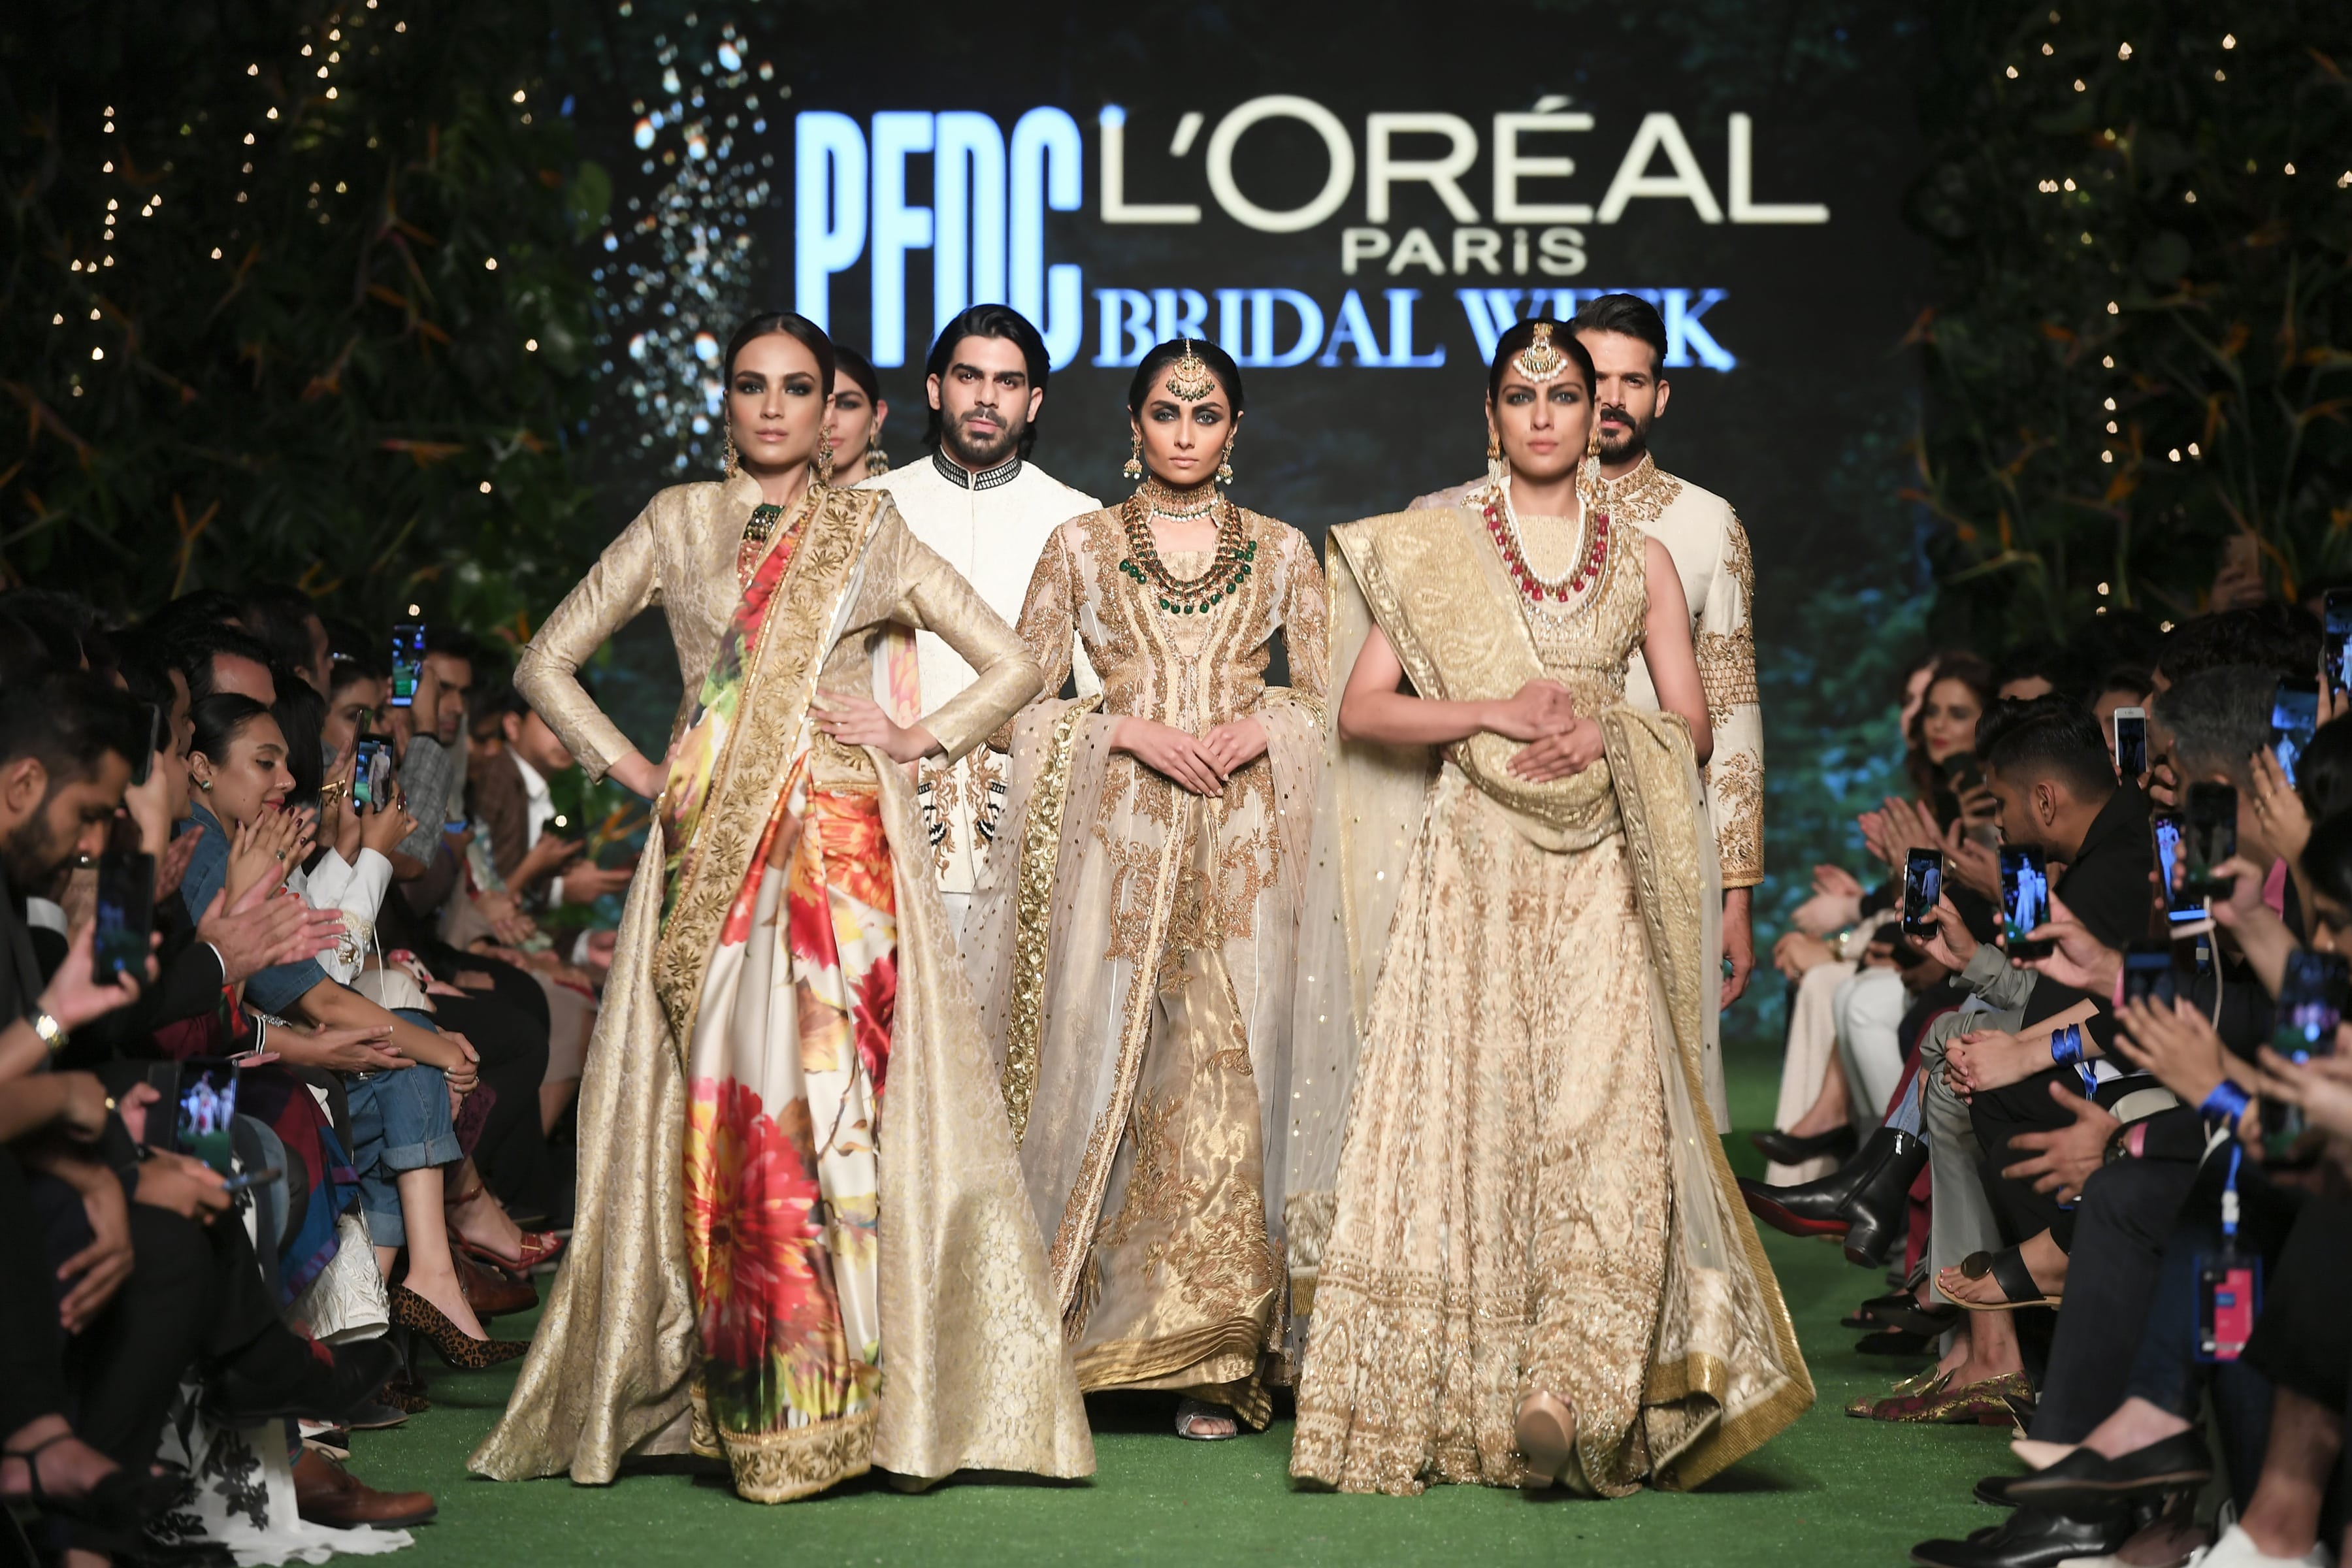 Pakistan S Glitzy Bridal Fashion Week Bows Out With Bold Finale Arab News Pk